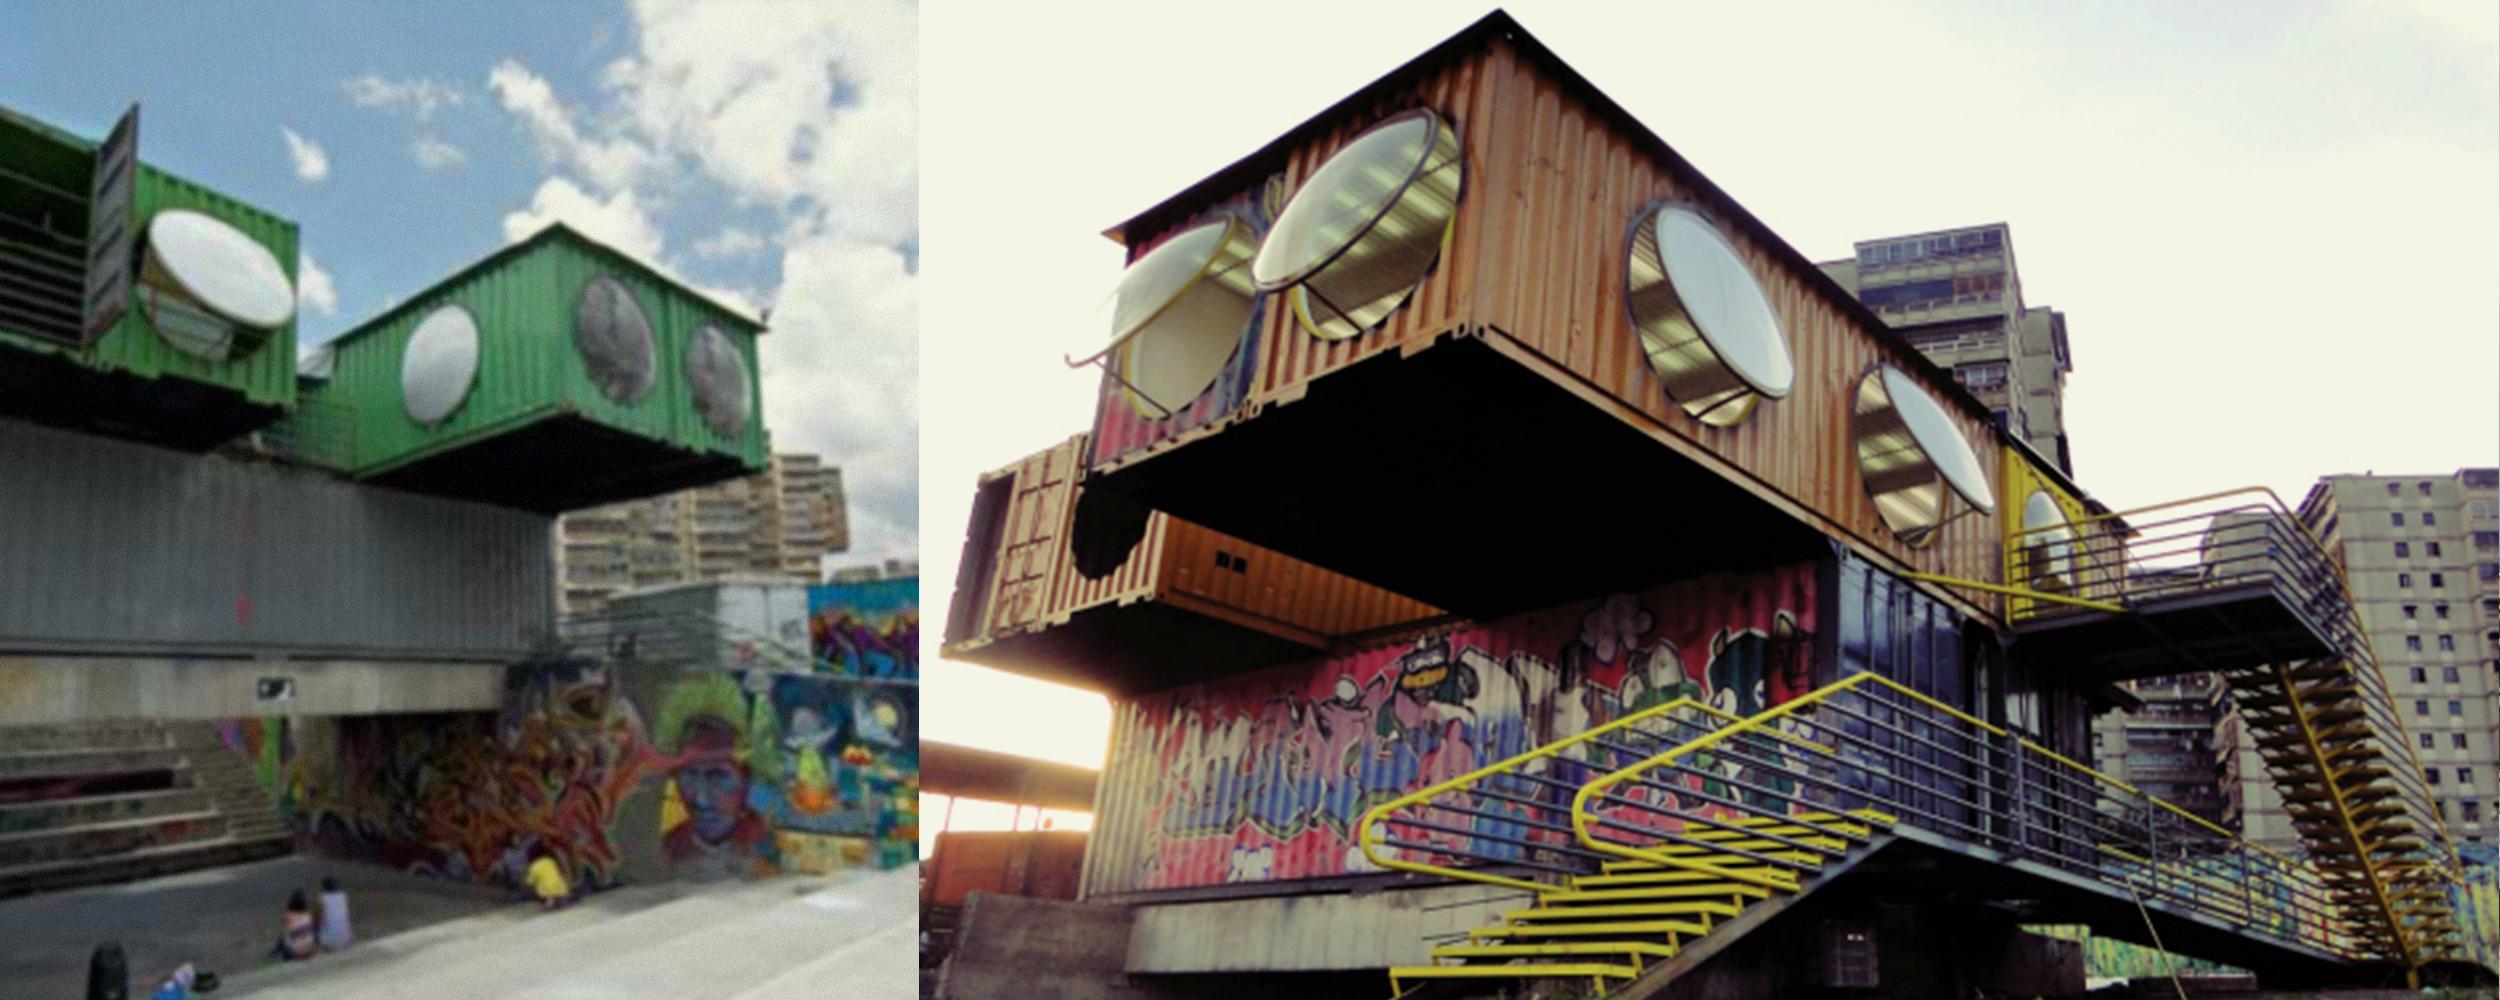 Tuna el Fuerte Cultural Park, Caracas, Venezuela, Lab.Pro.Fab. Photo: Eleanna Cadalso.